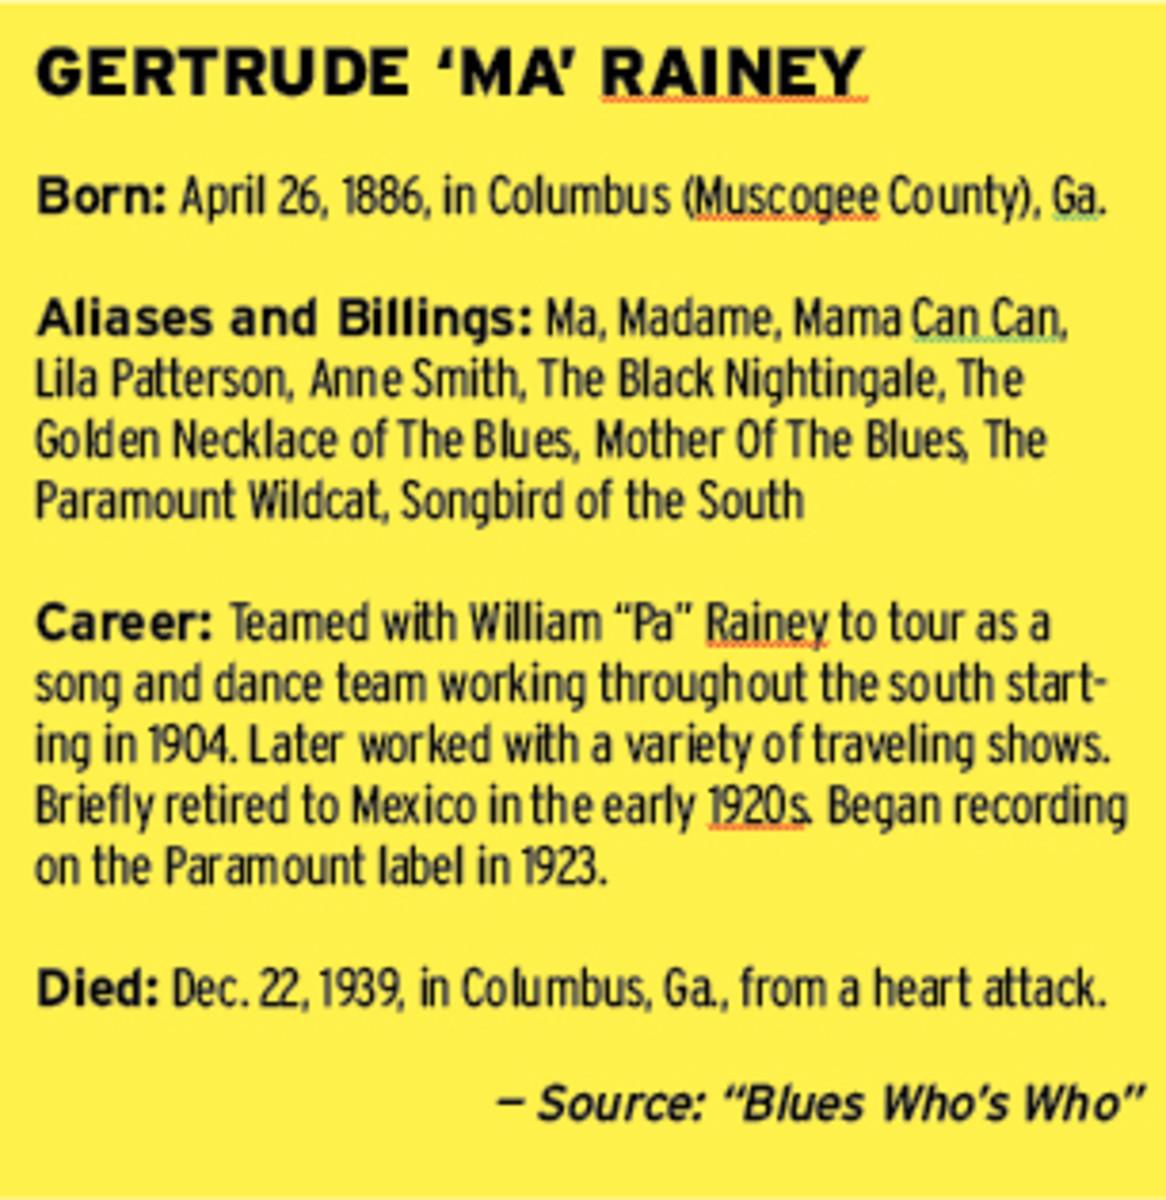 About Gertrude Ma Rainey